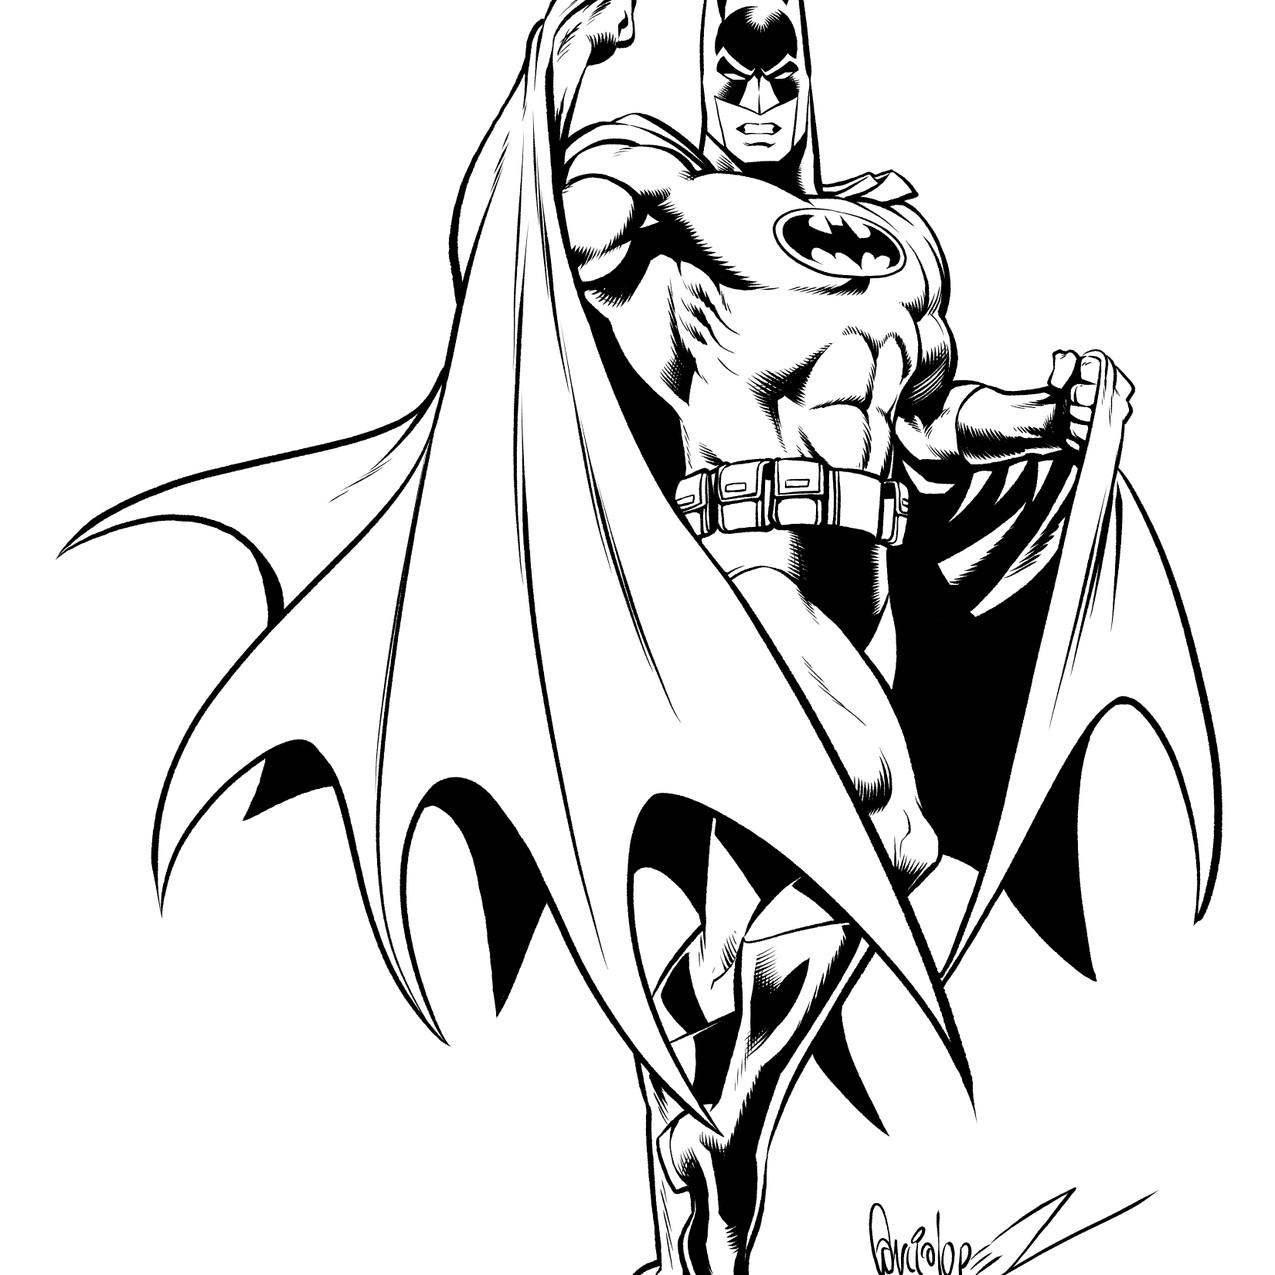 Batman inks by Dave Beaty